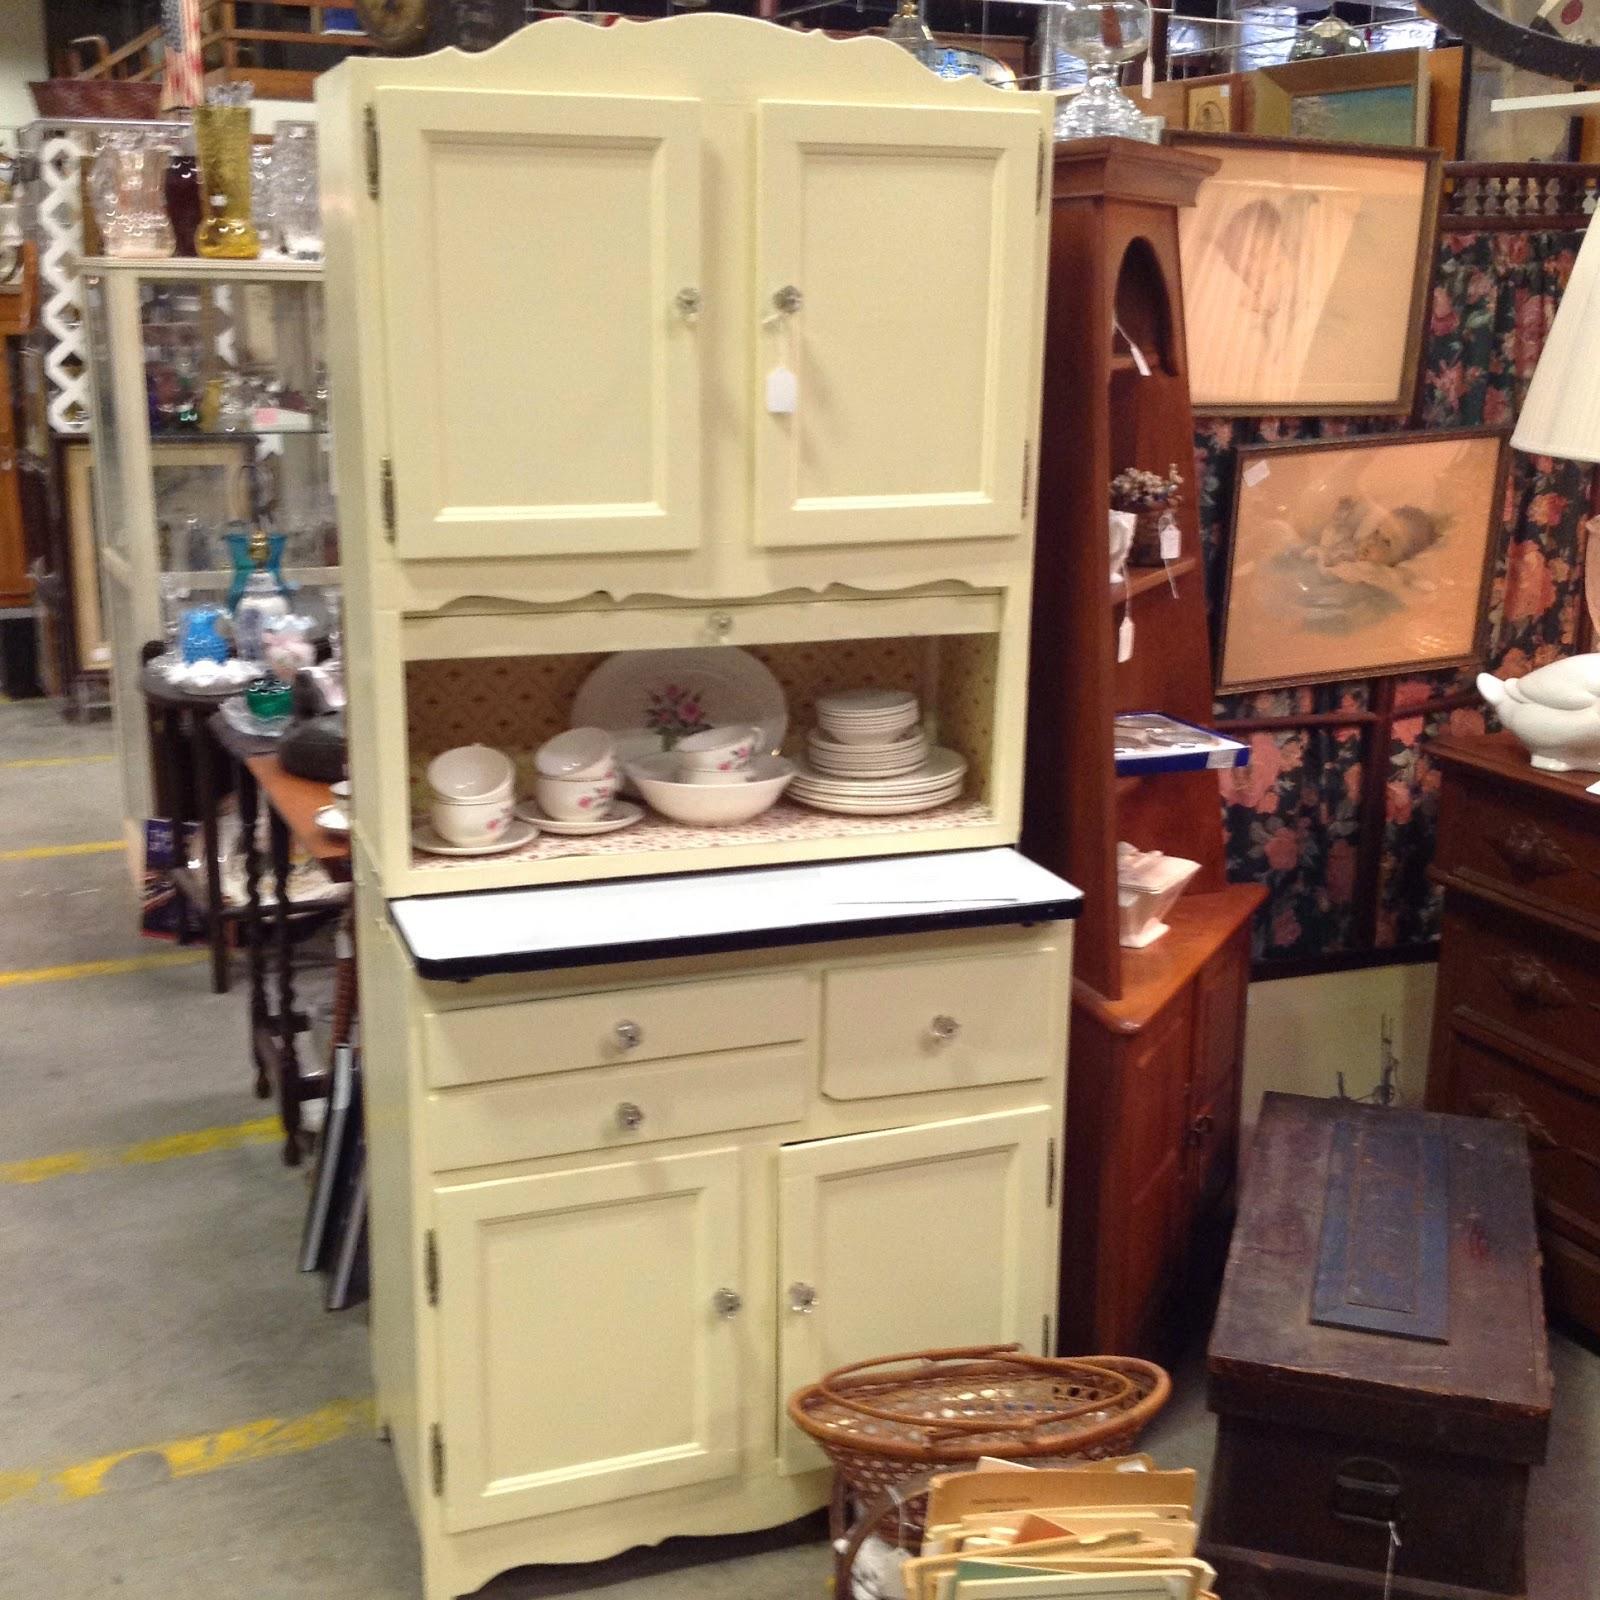 Hoosier Kitchen Cabinet: Kitsch 'n Stuff: Old Style Hoosier